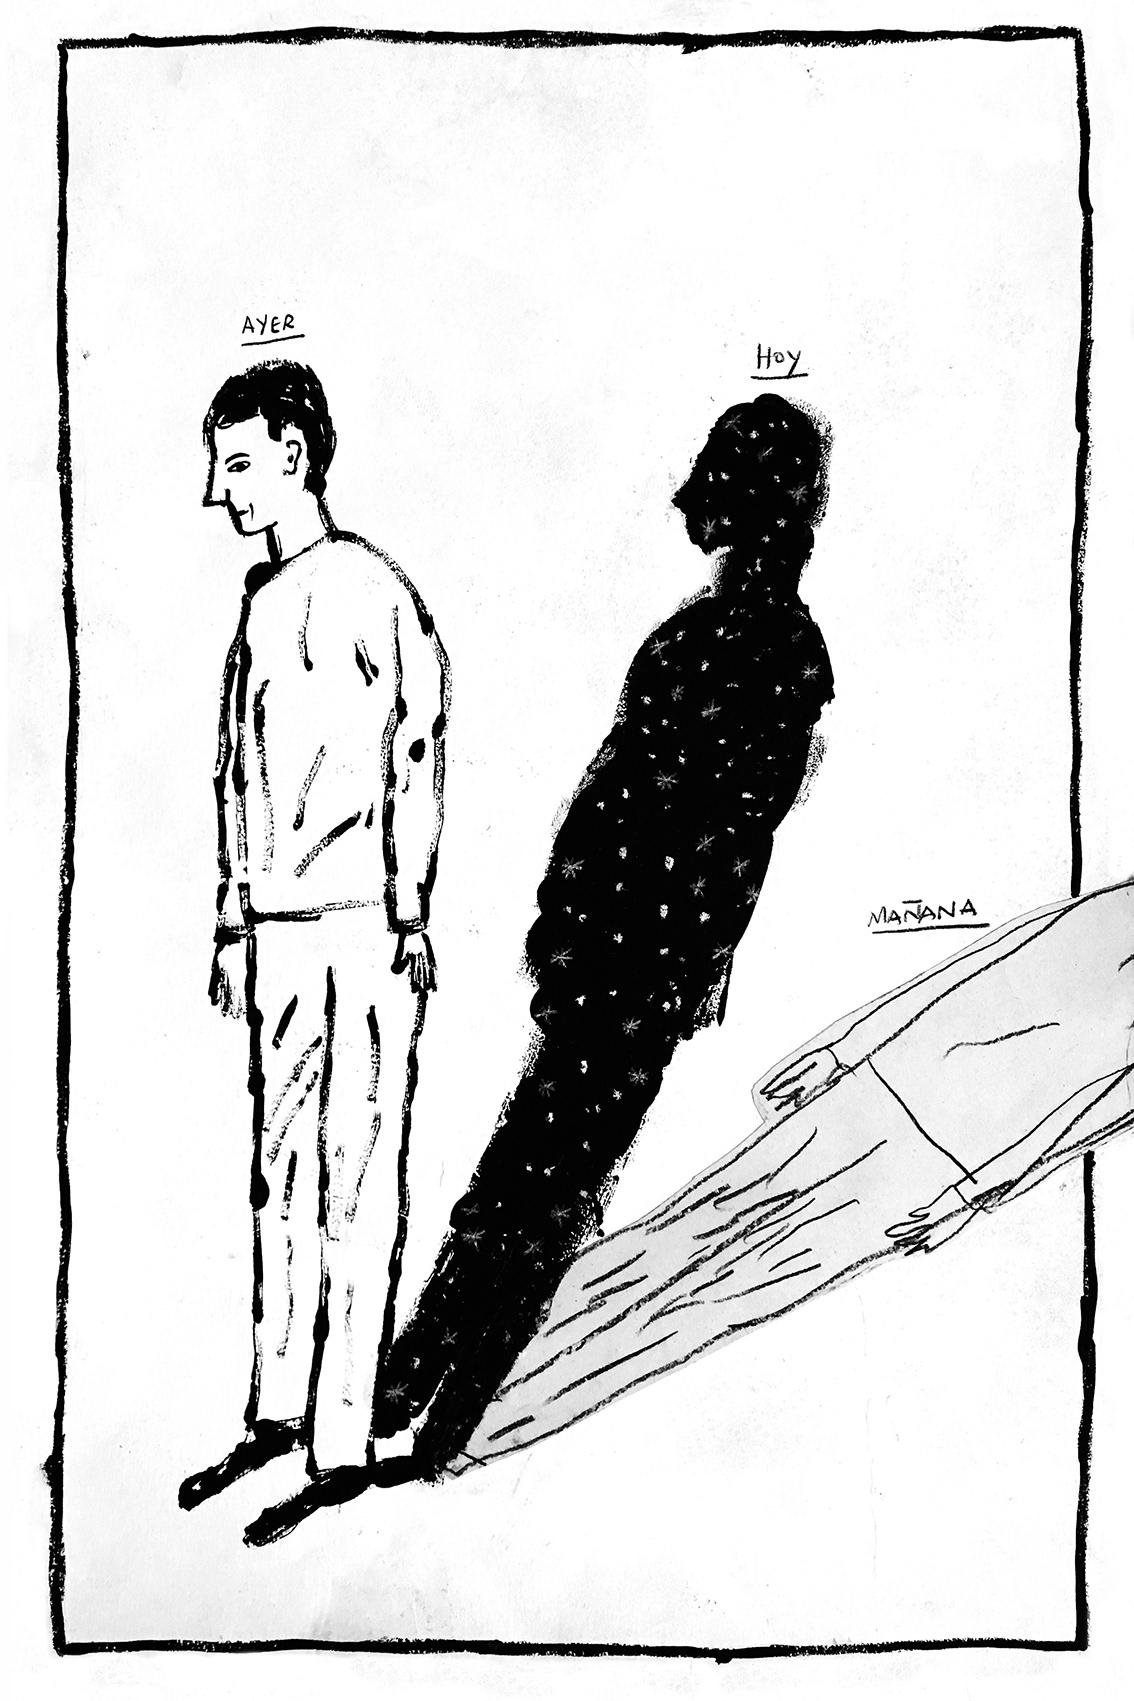 black and white conceptual cosmos DIY editorial ILLUSTRATION  Riso TRANSFER Zine  Show